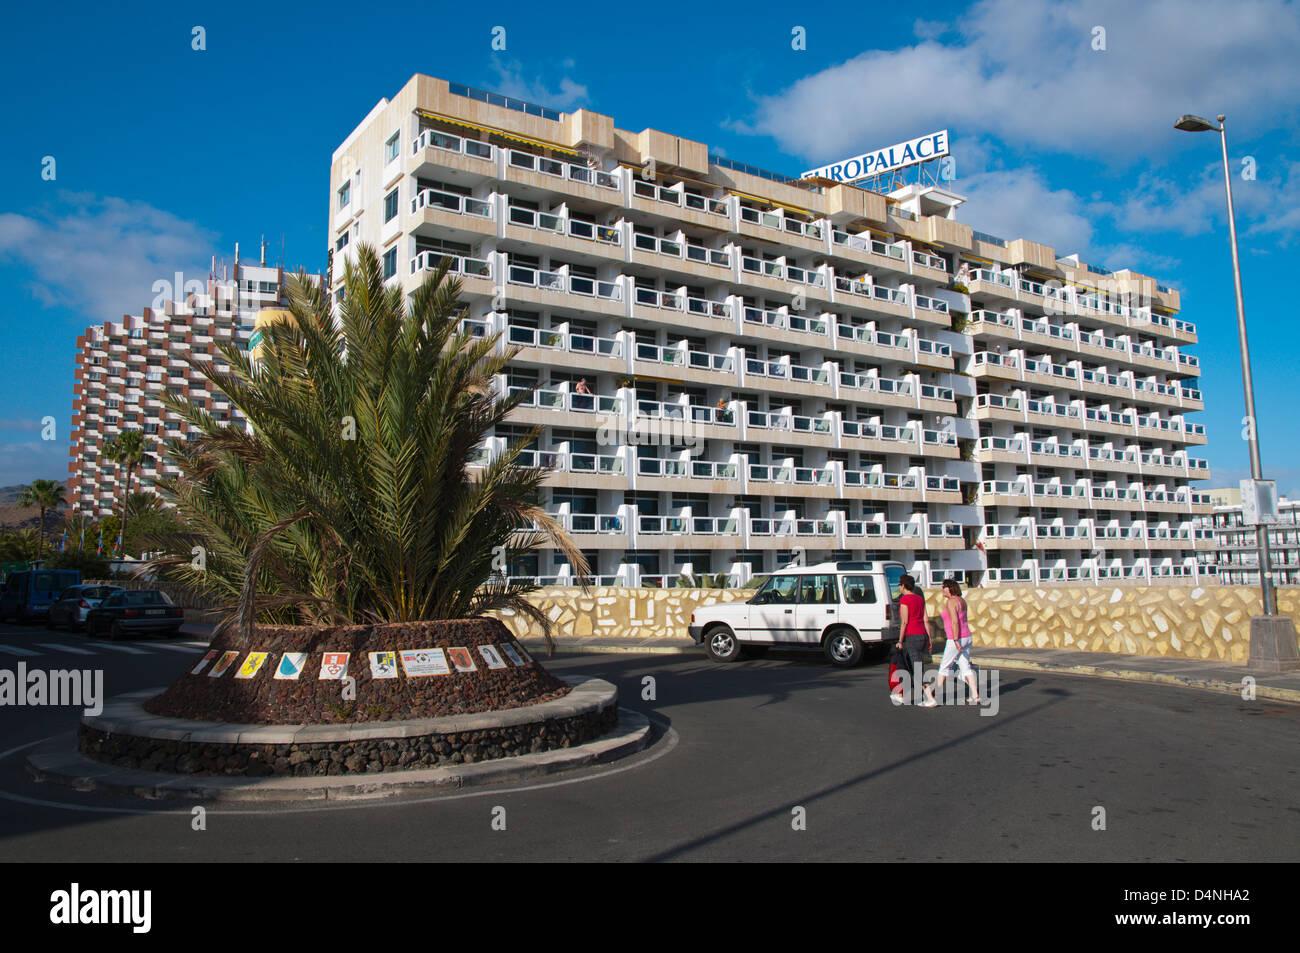 Hotel Europalace Playa Del Ingles